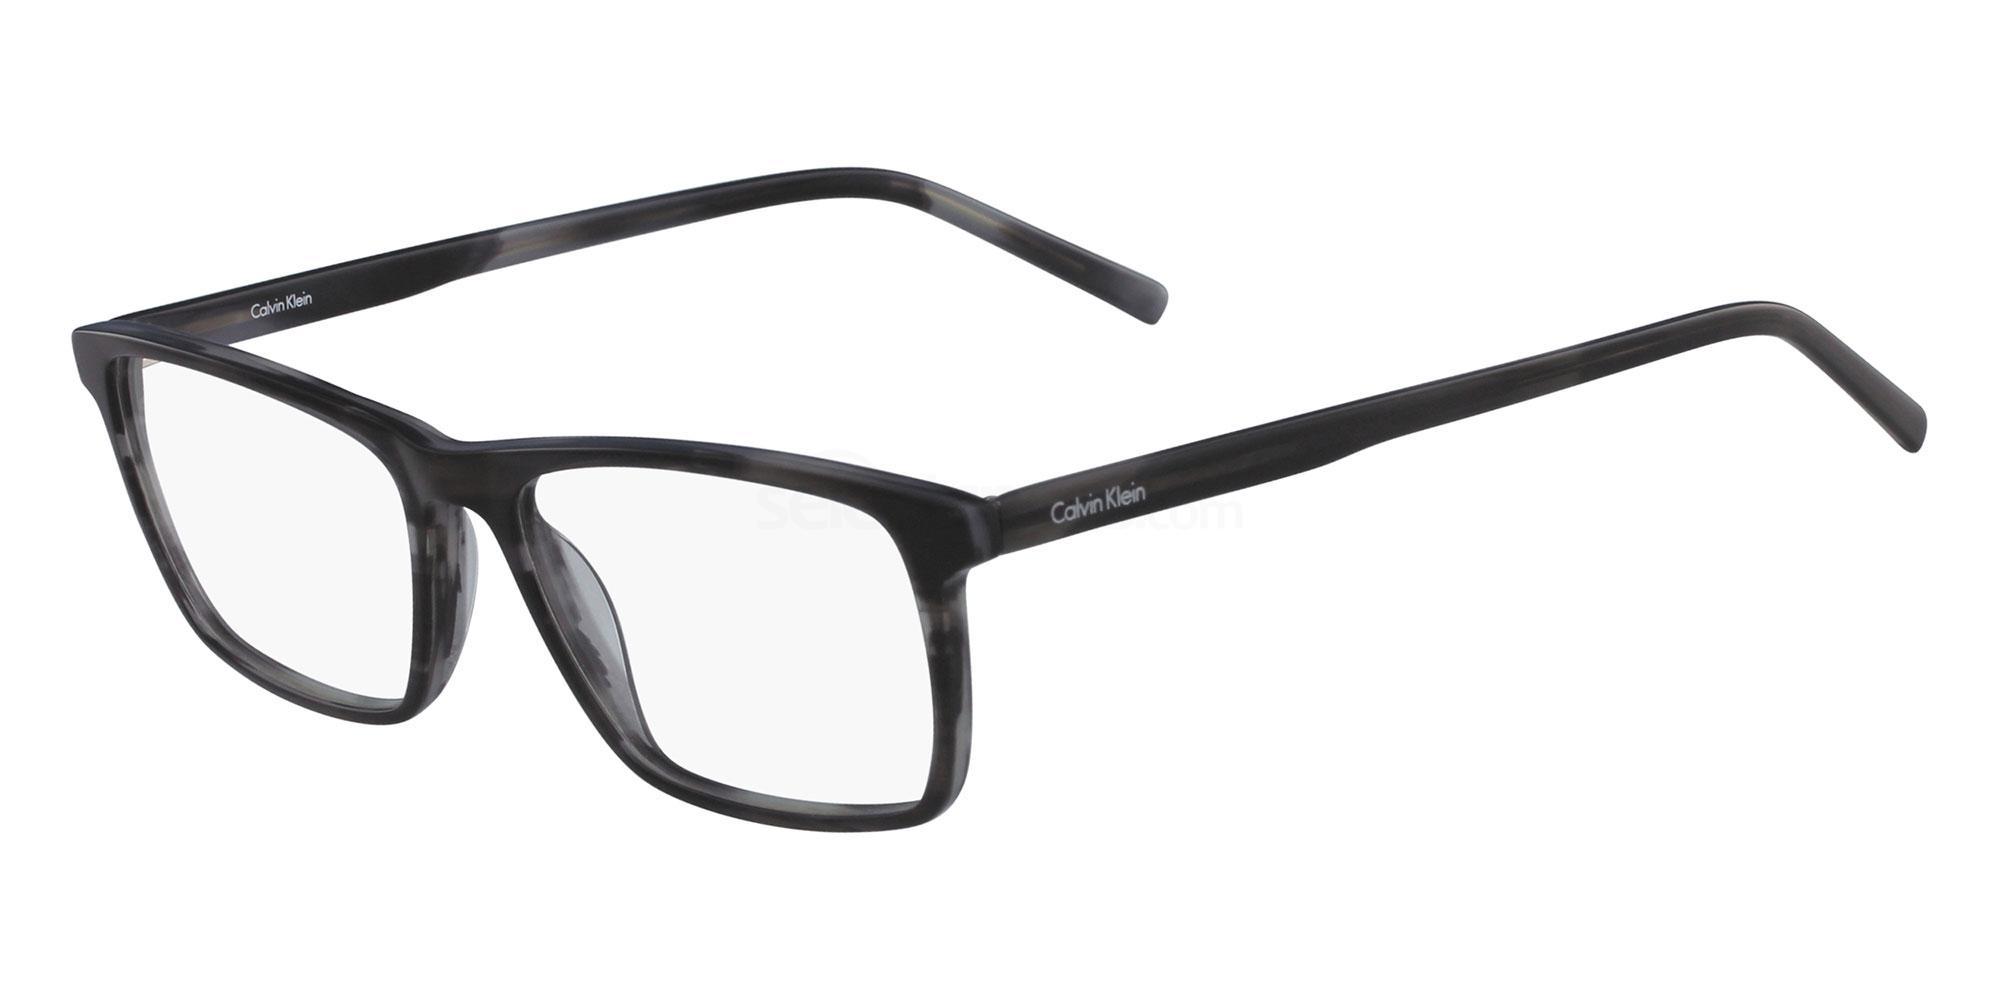 064 CK6009 Glasses, Calvin Klein